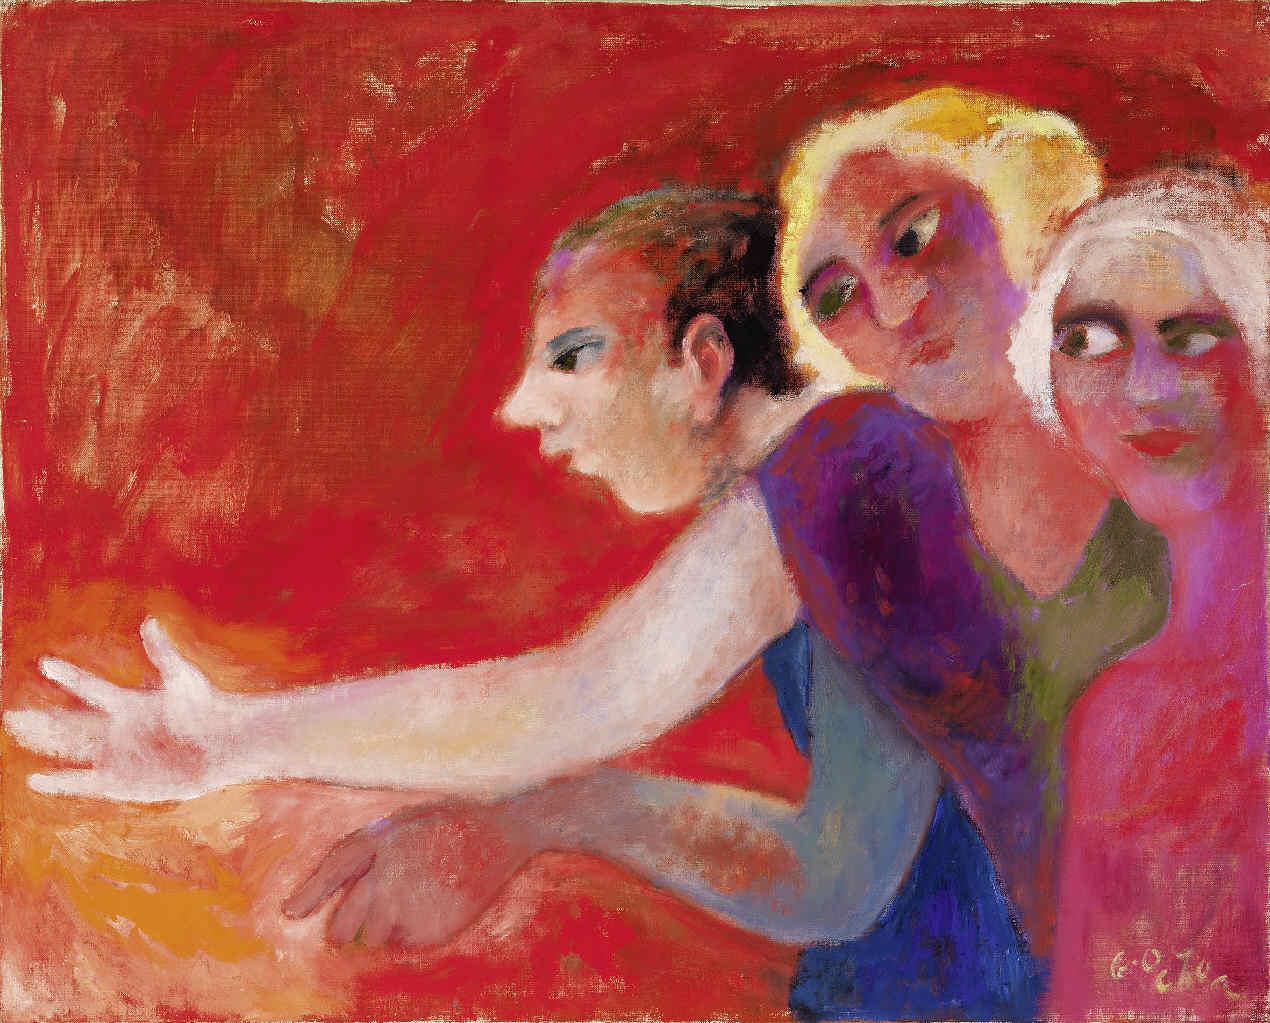 GARCÍA OCHOA, Luis, <i>Figuras contemplándose</i>